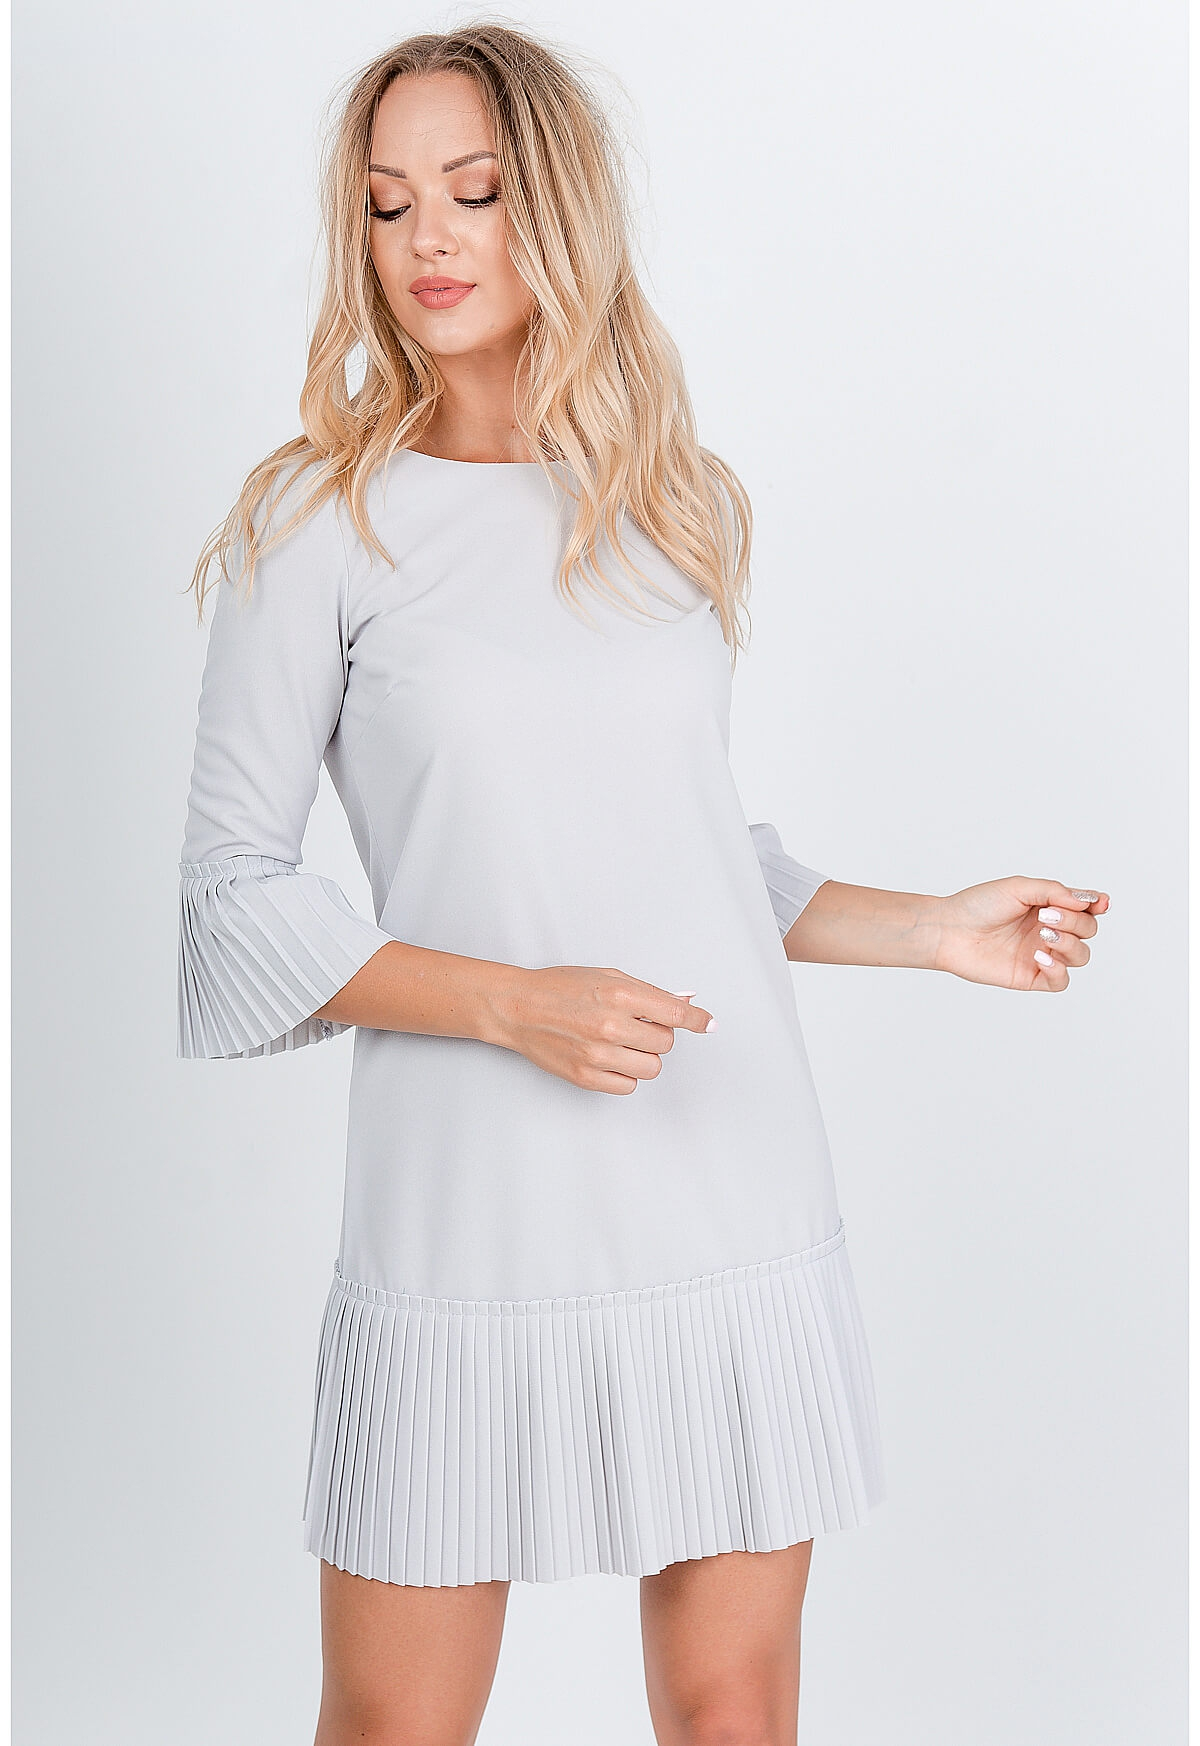 Krátke sivé šaty zdobené volánmi - L